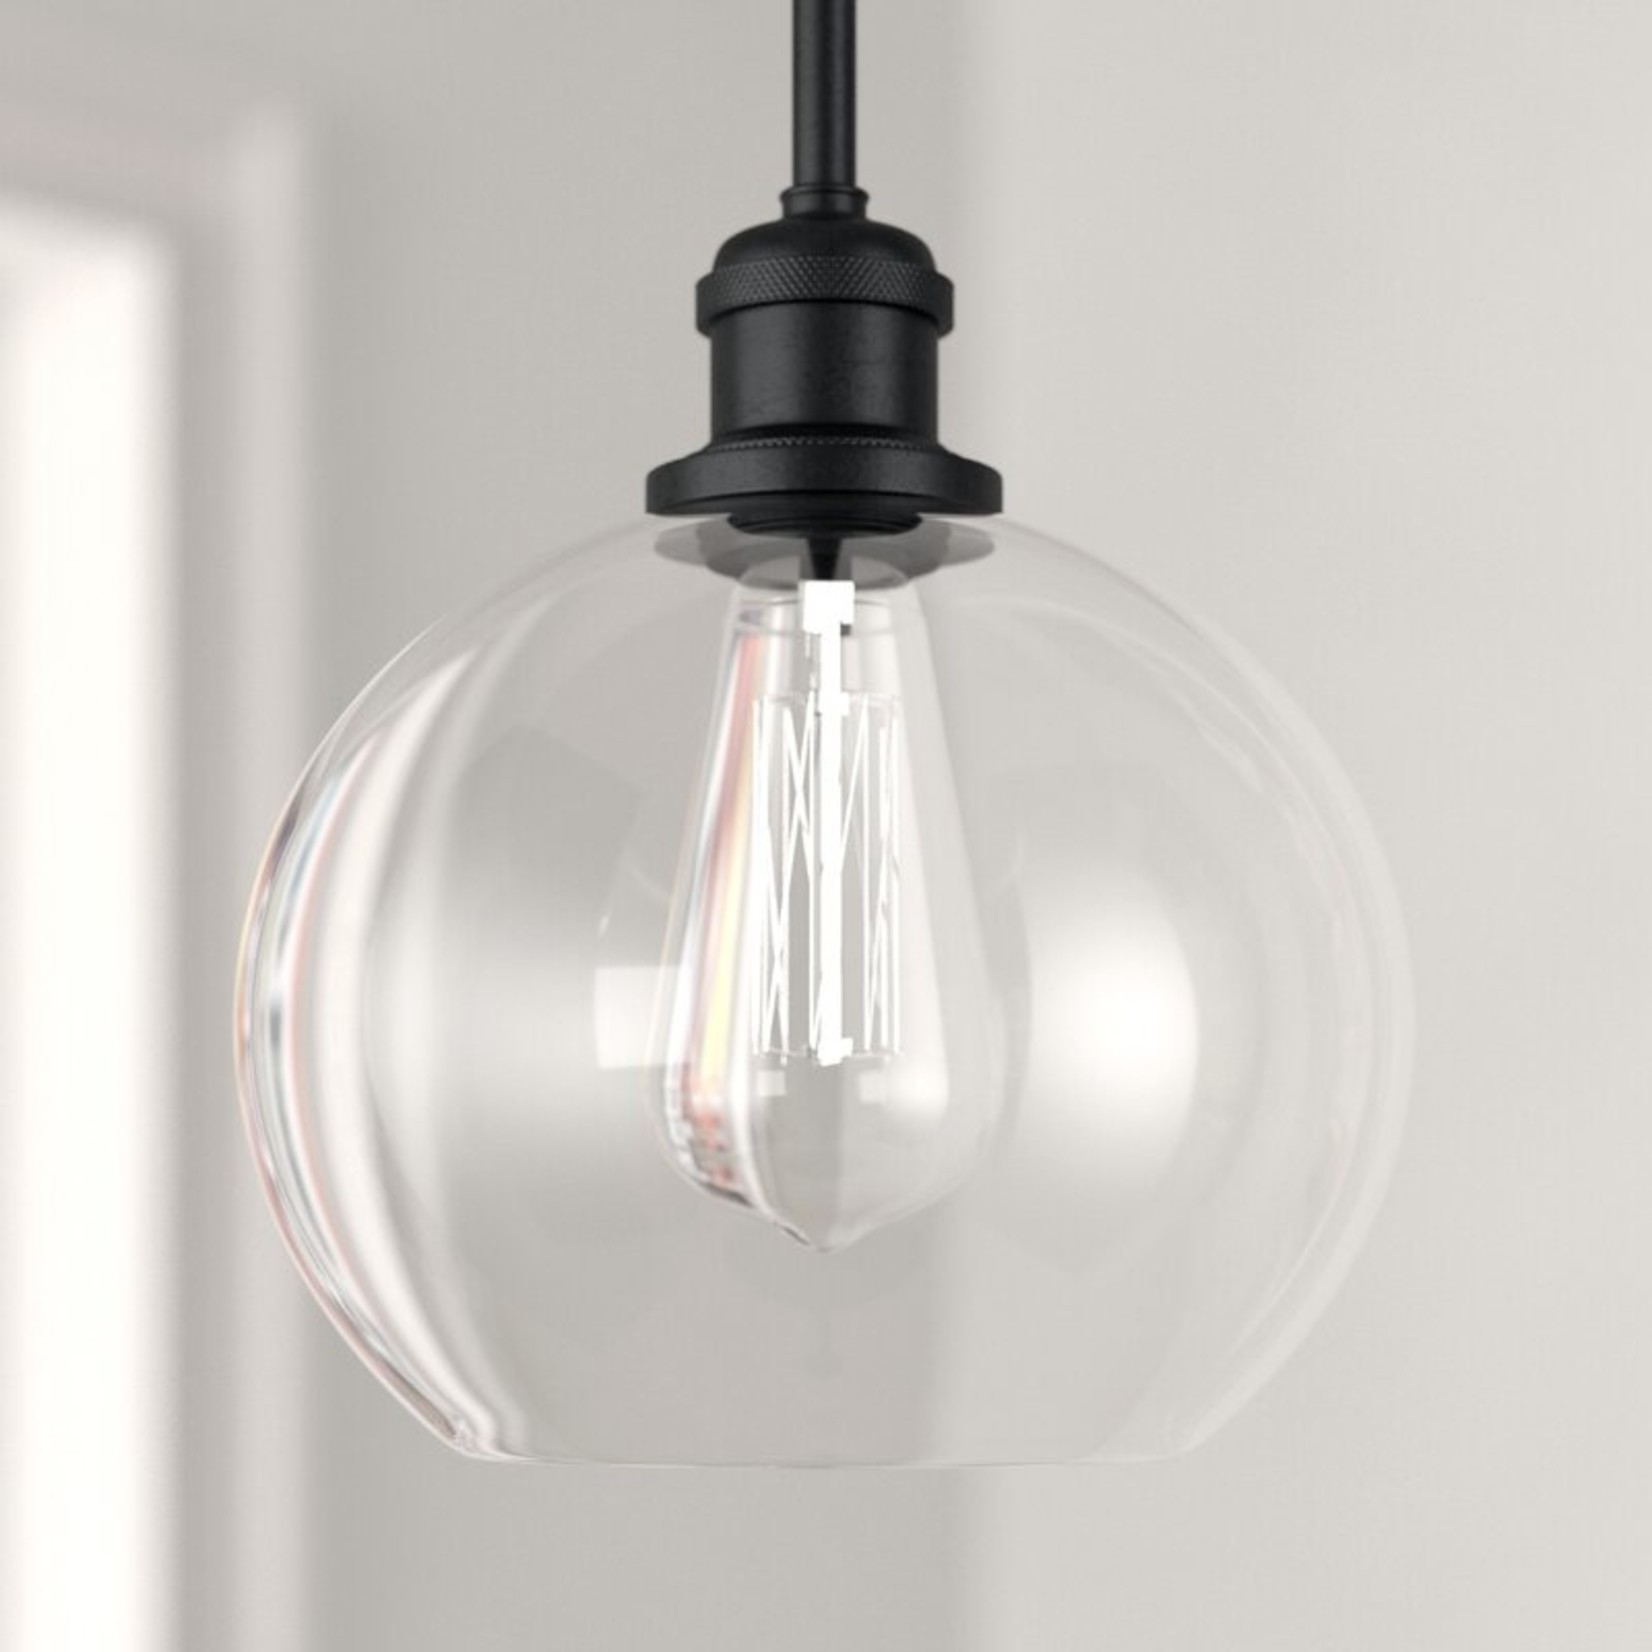 *Anchondo 1 - Light Single Globe Pendant - Matte Black